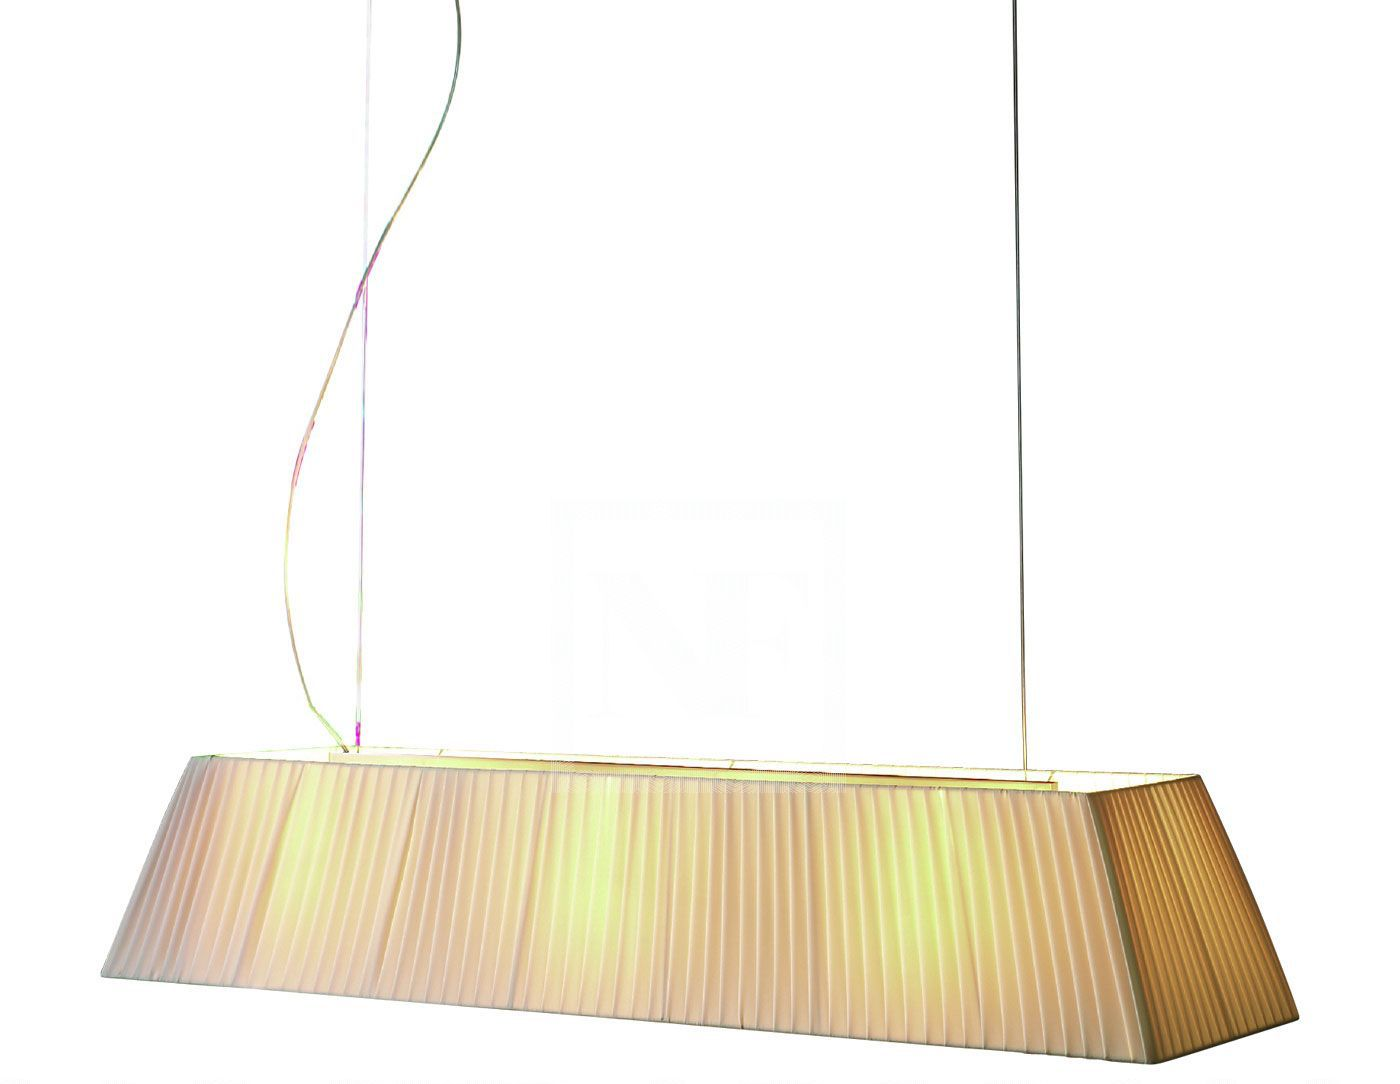 Mei - 180 (Solo Estructura) Lámpara Colgante sin pantalla E27 11w Hierro negro